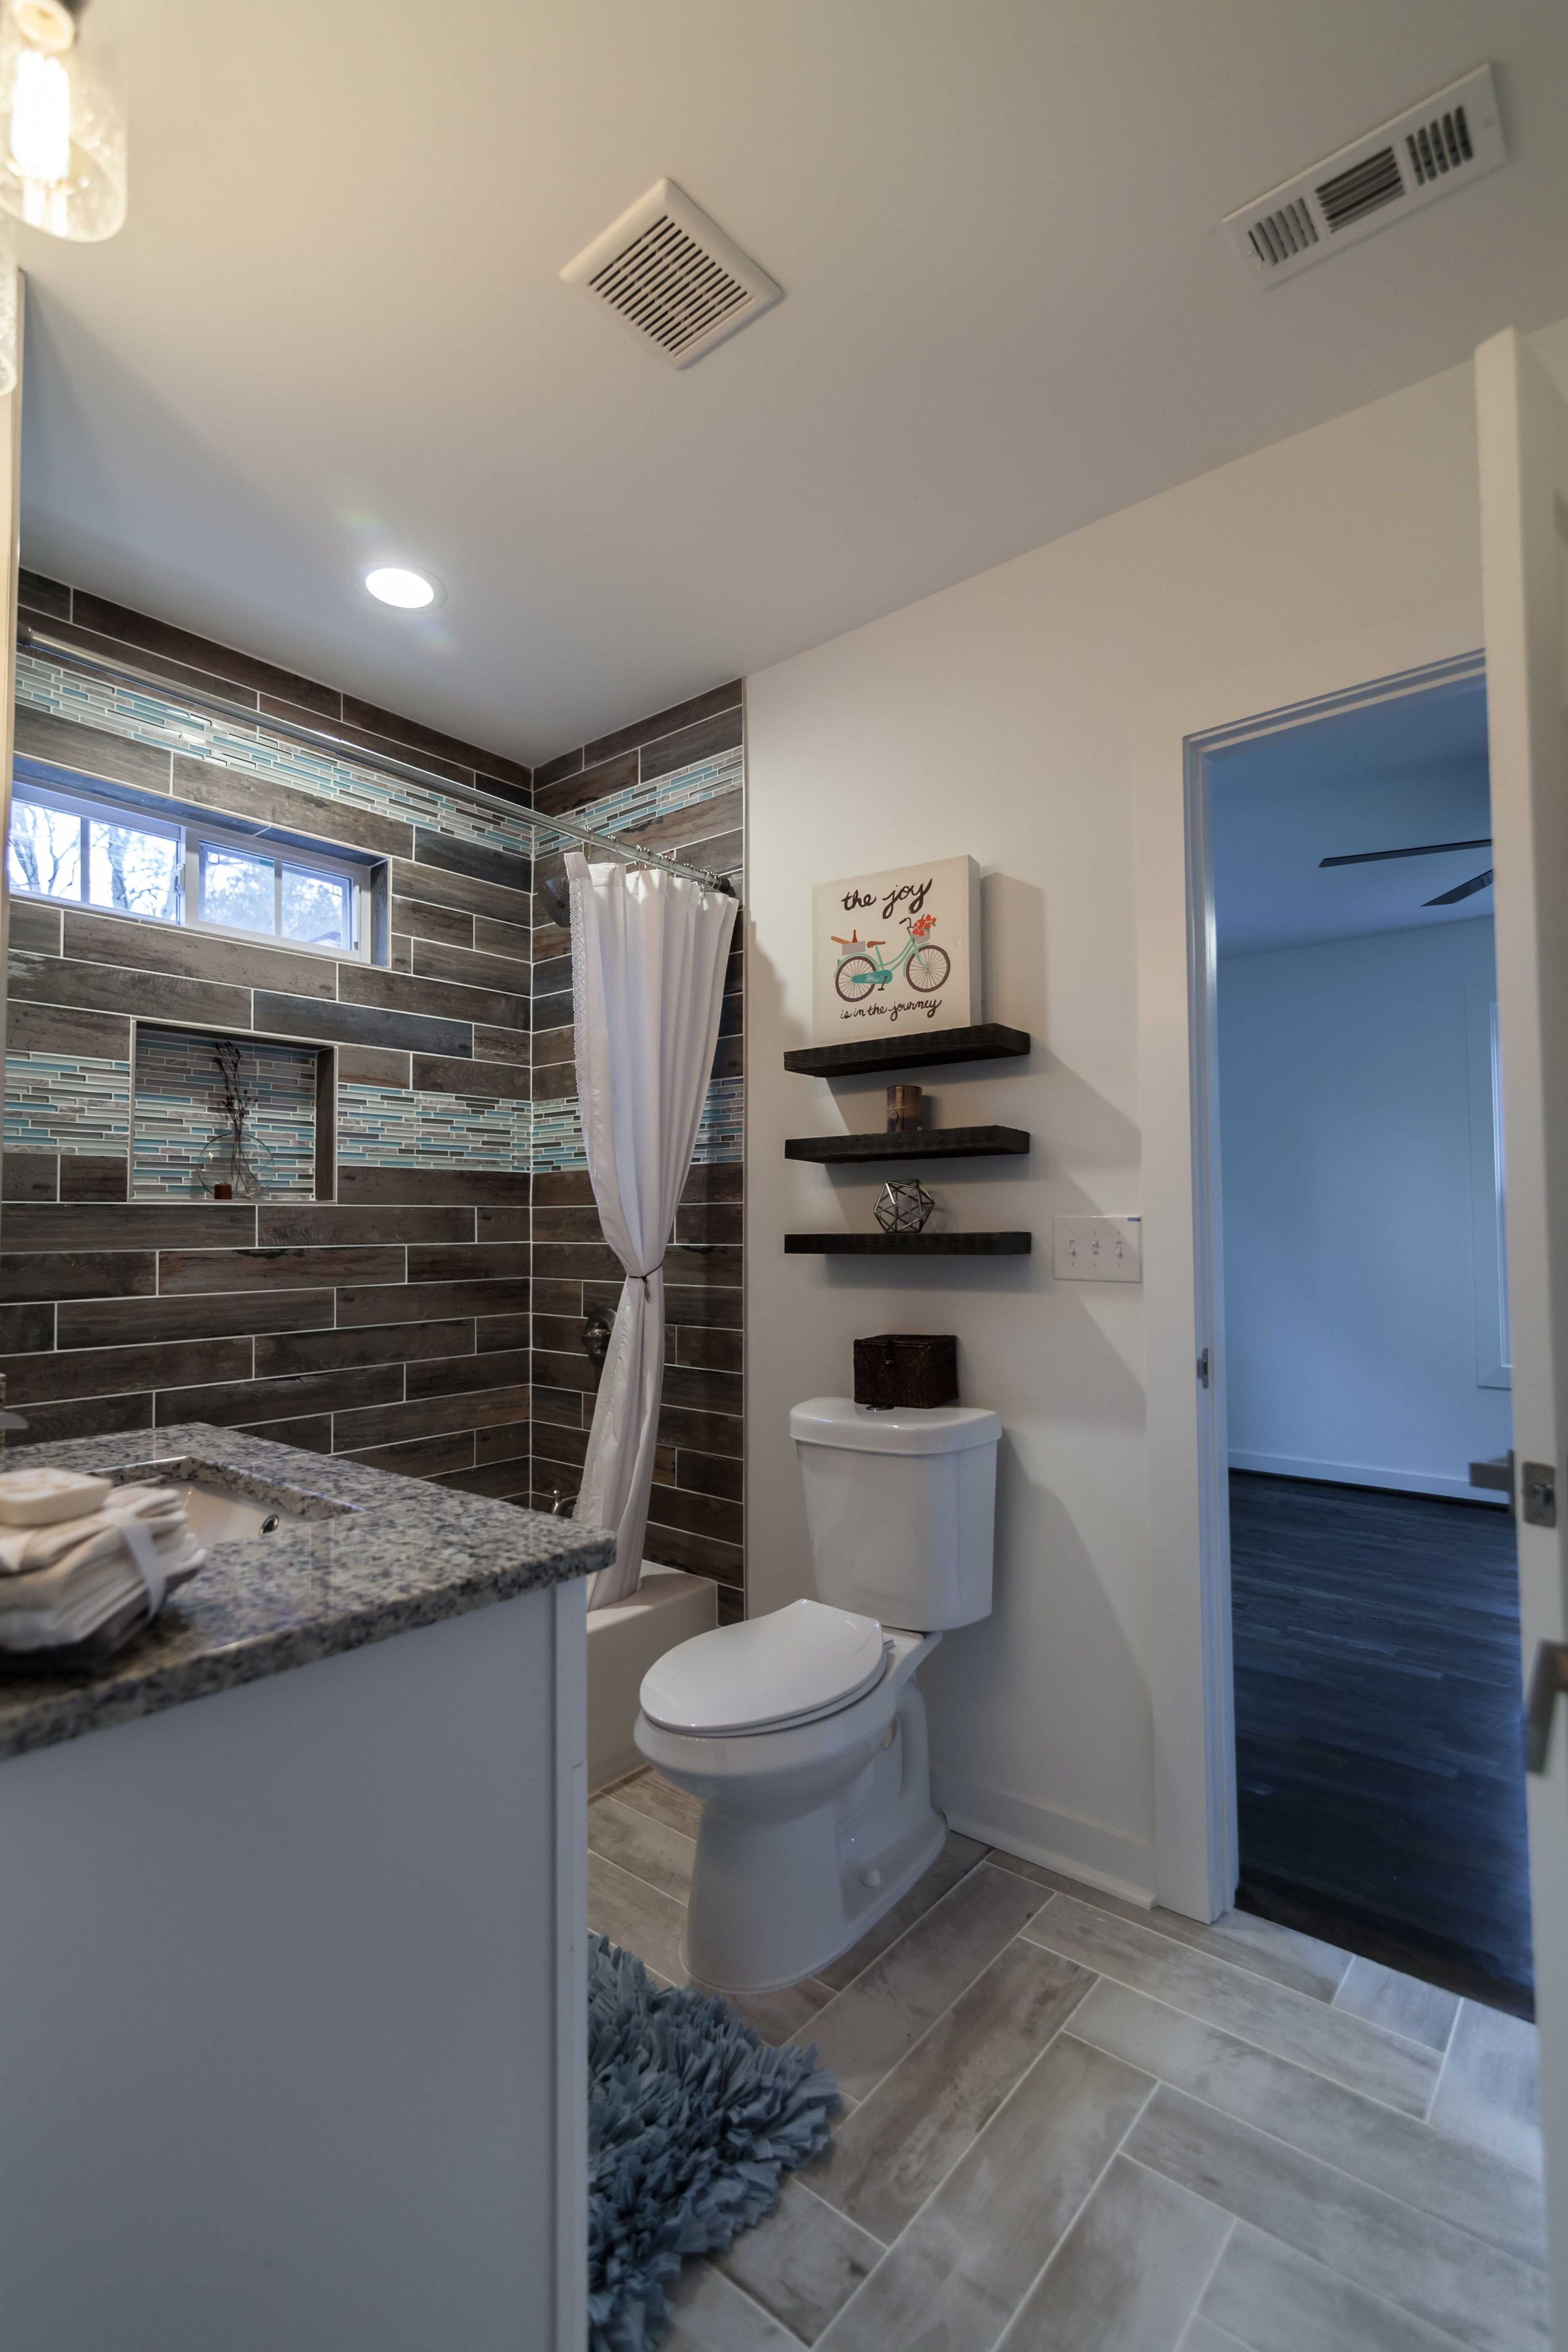 Mog Improvement Services Home Remodelers In Acworth Ga Bathroom Design New Bathroom Designs Bathrooms Remodel